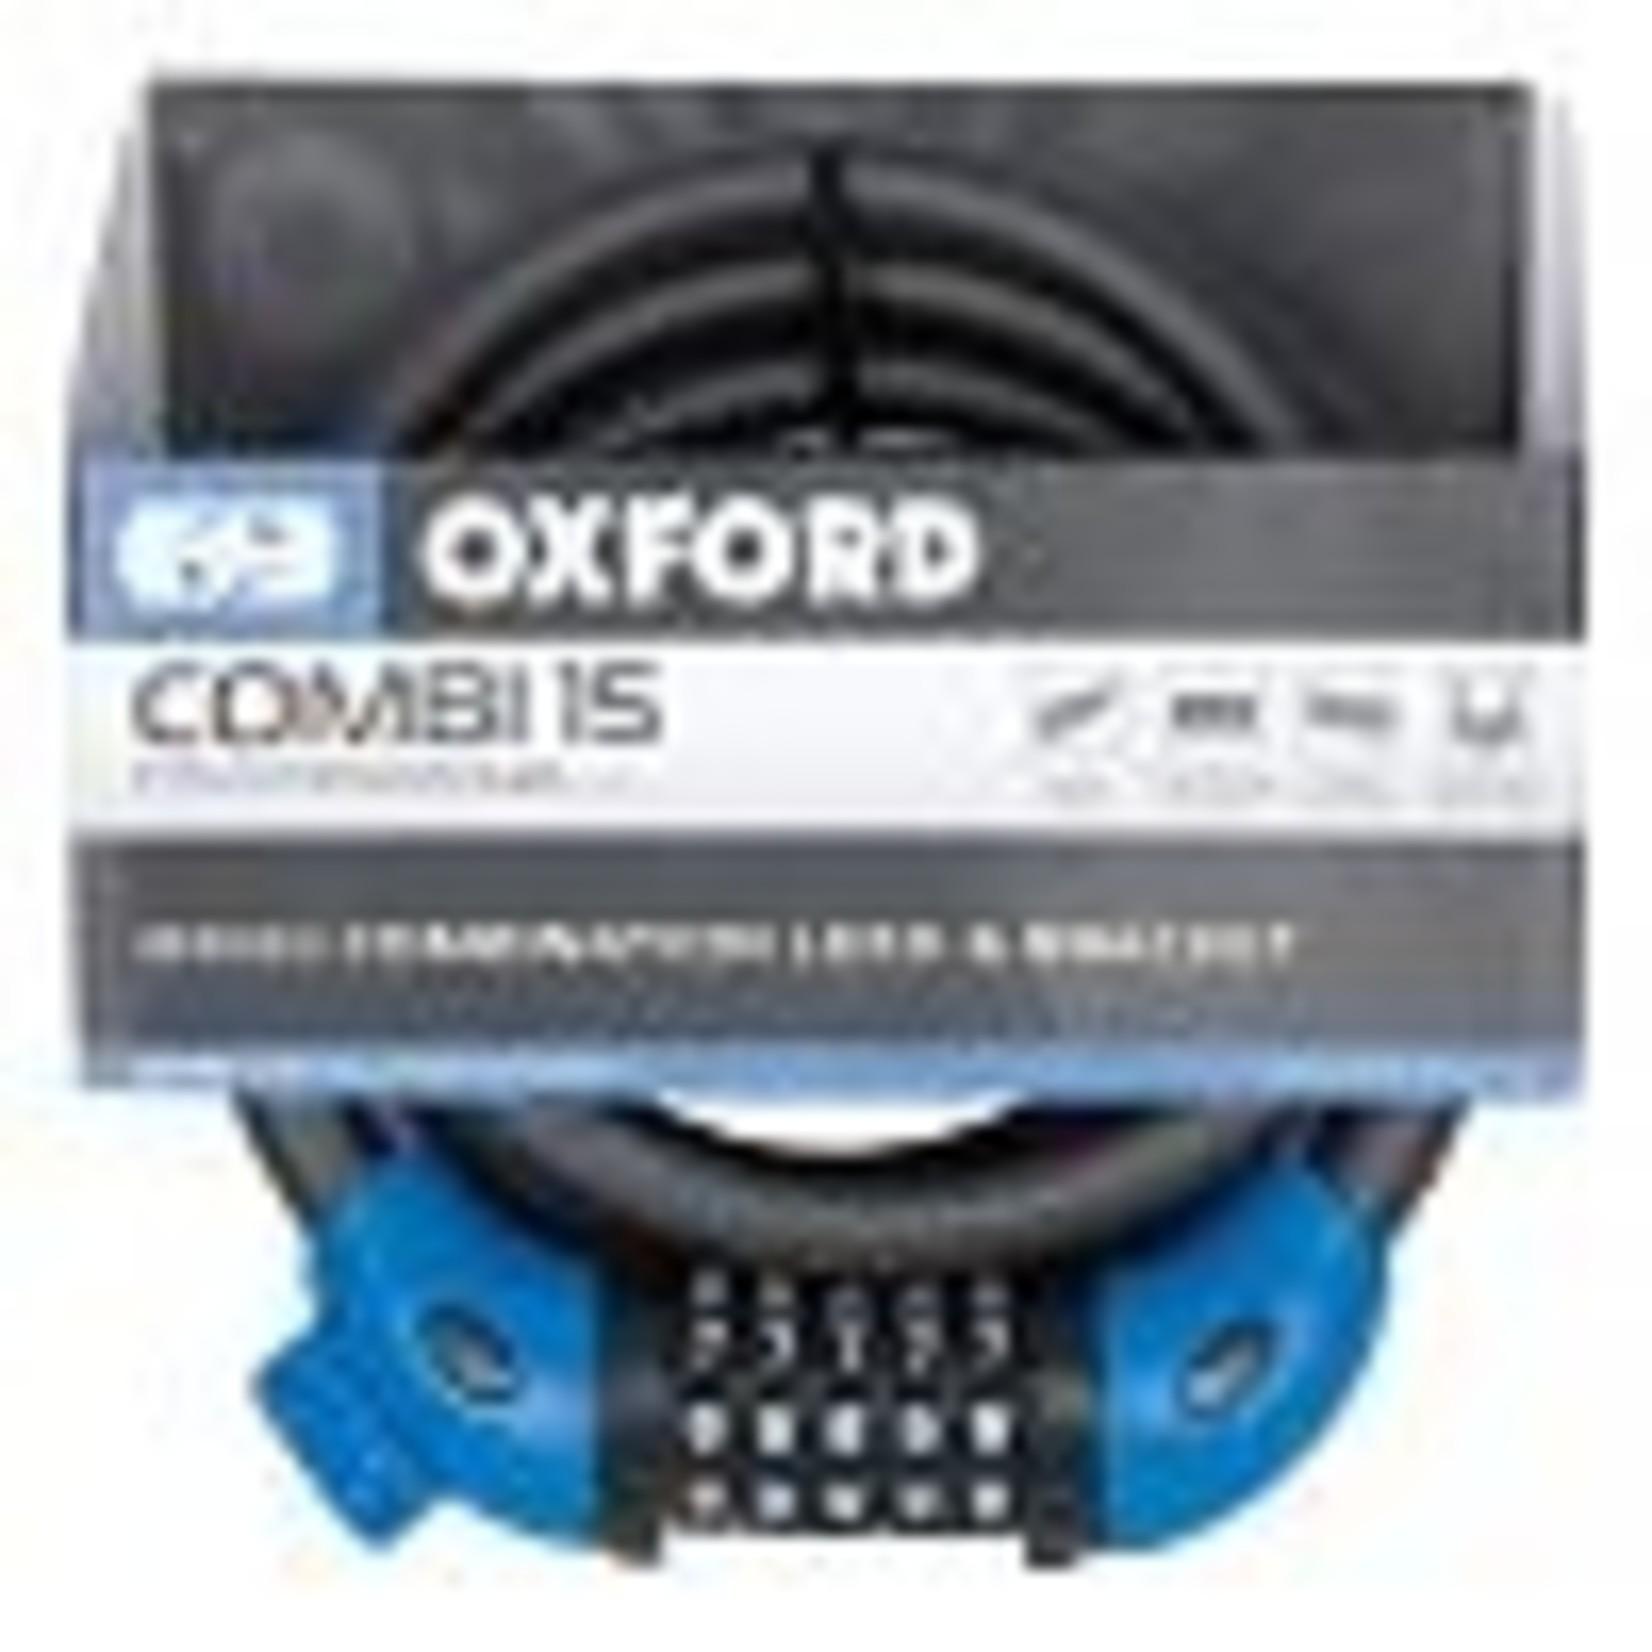 Oxford LK235 COMBI 15 Lock - 15mm x 1.5m - SMOKE